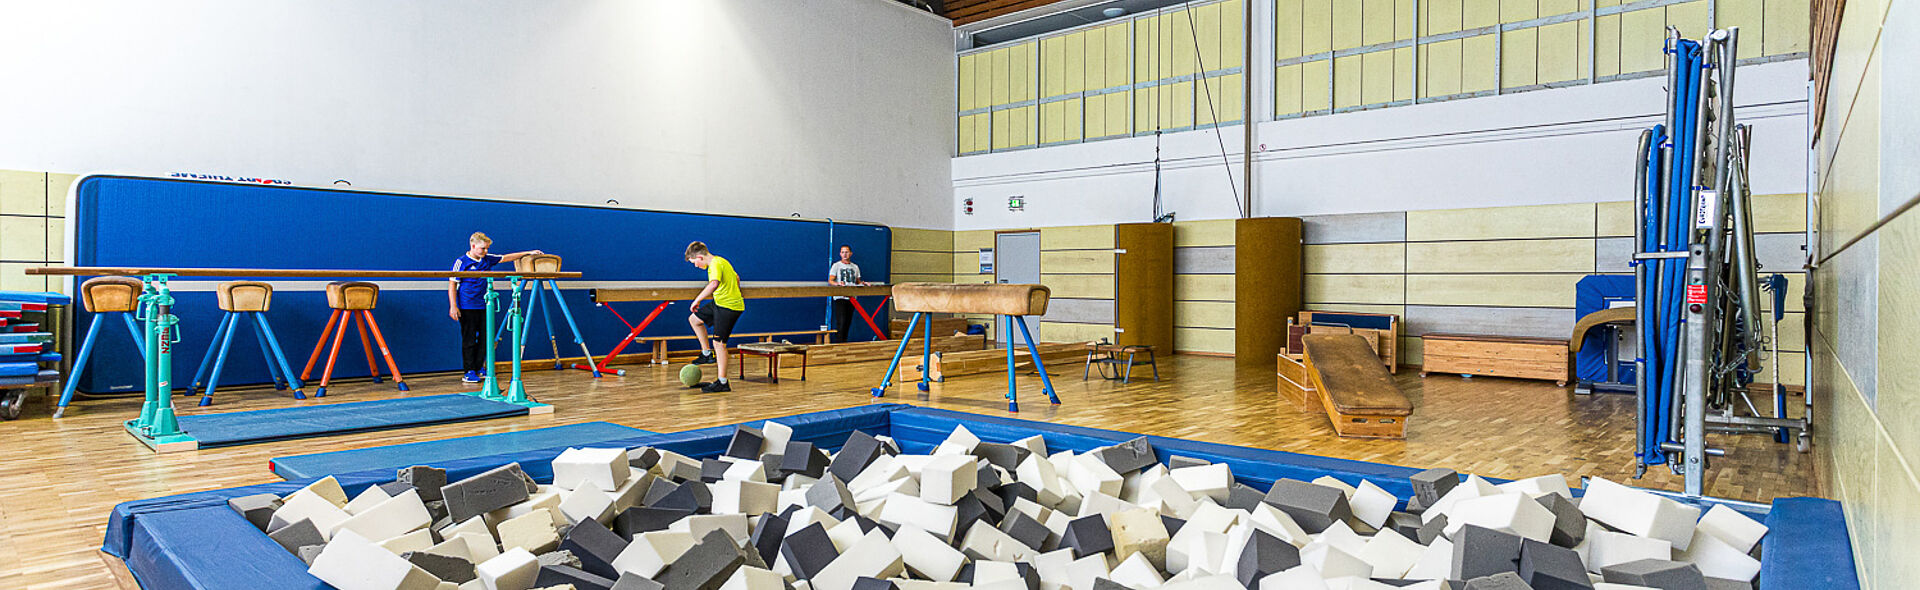 Bundesstützpunkt Oberwiesenthal Trainingszentrum Athletikhalle